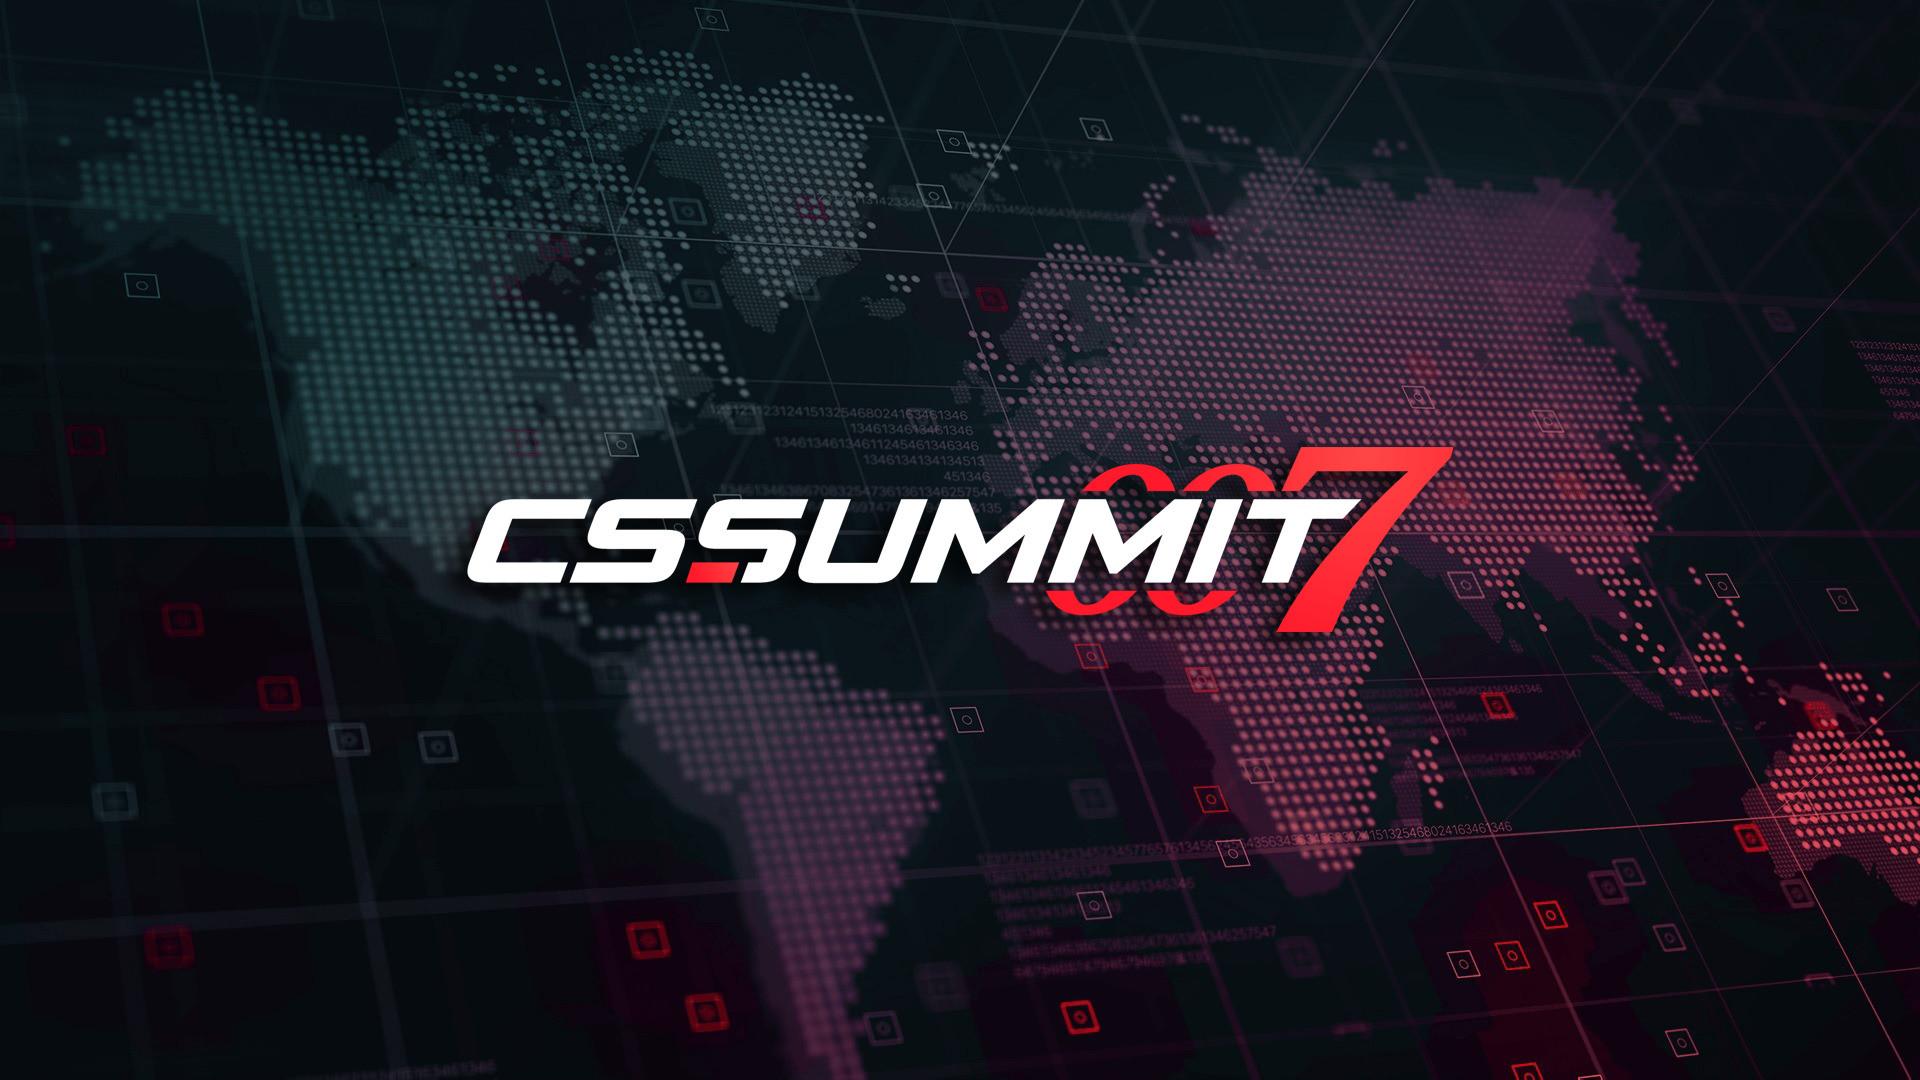 cs_summit 7 : Virtus pro l'emporte face à fnatic !